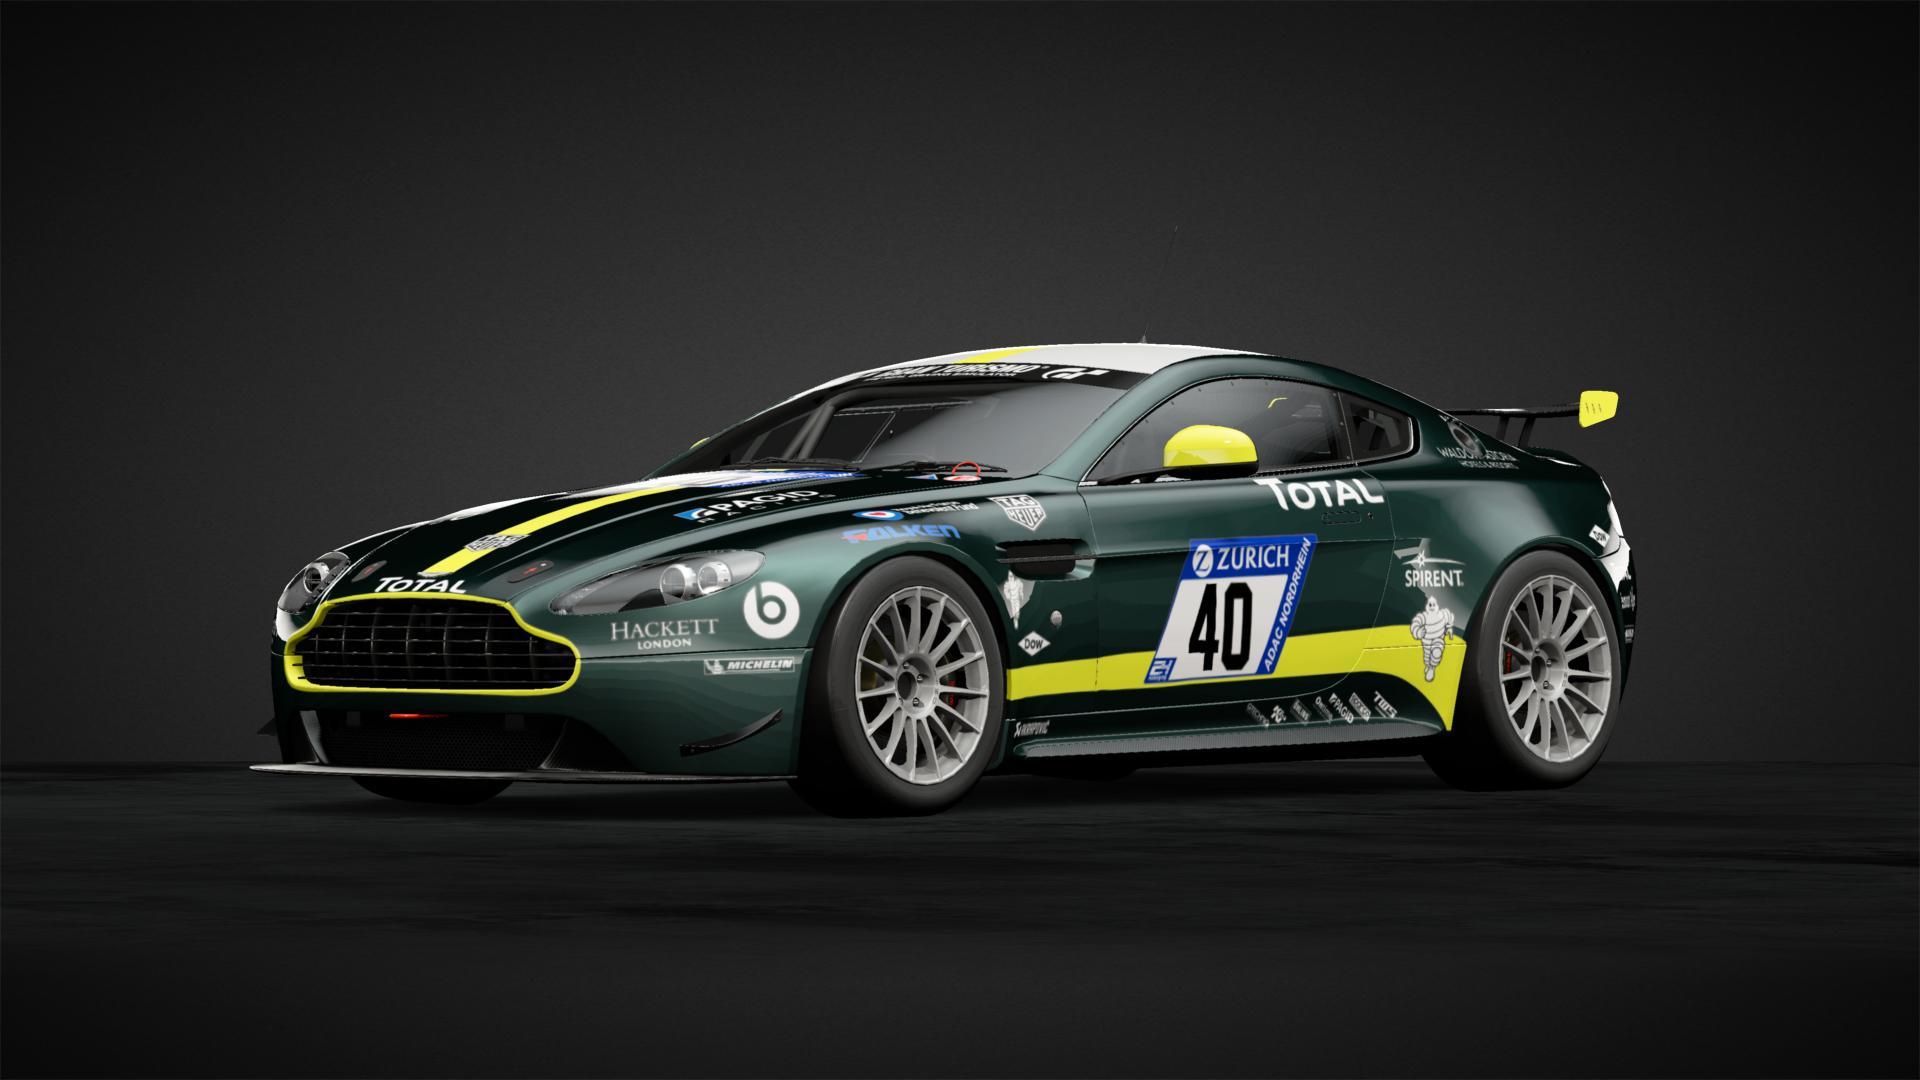 Aston Martin Vantage V8 Gt4 Car Livery By Veekno206 Community Gran Turismo Sport